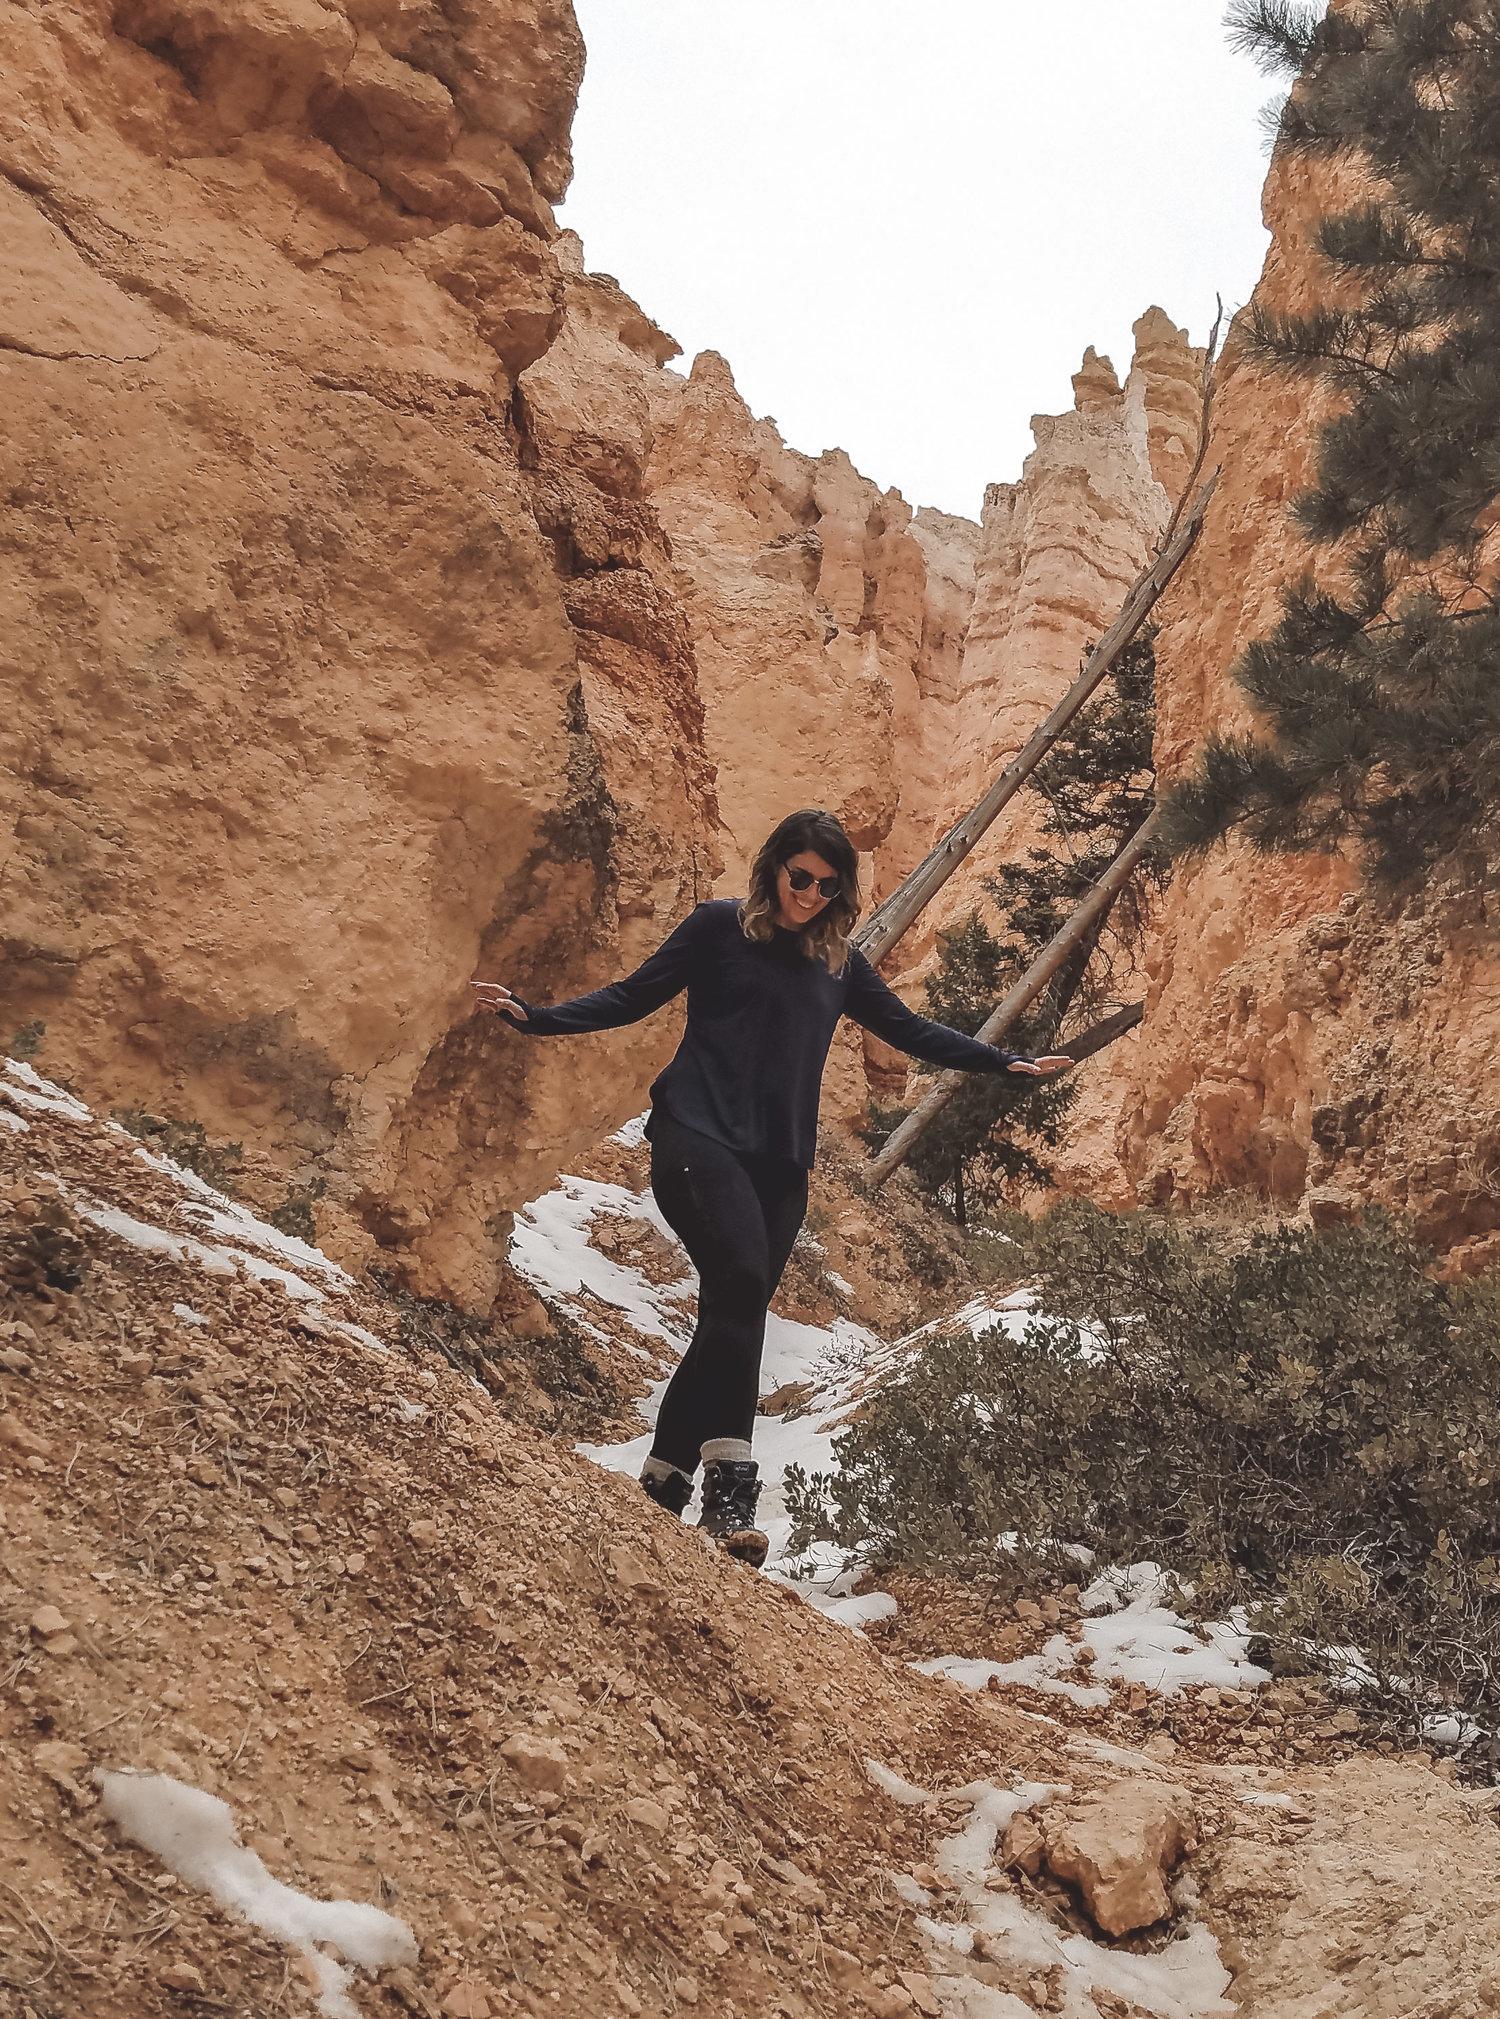 bryce_canyon_national_park_hiking.jpg